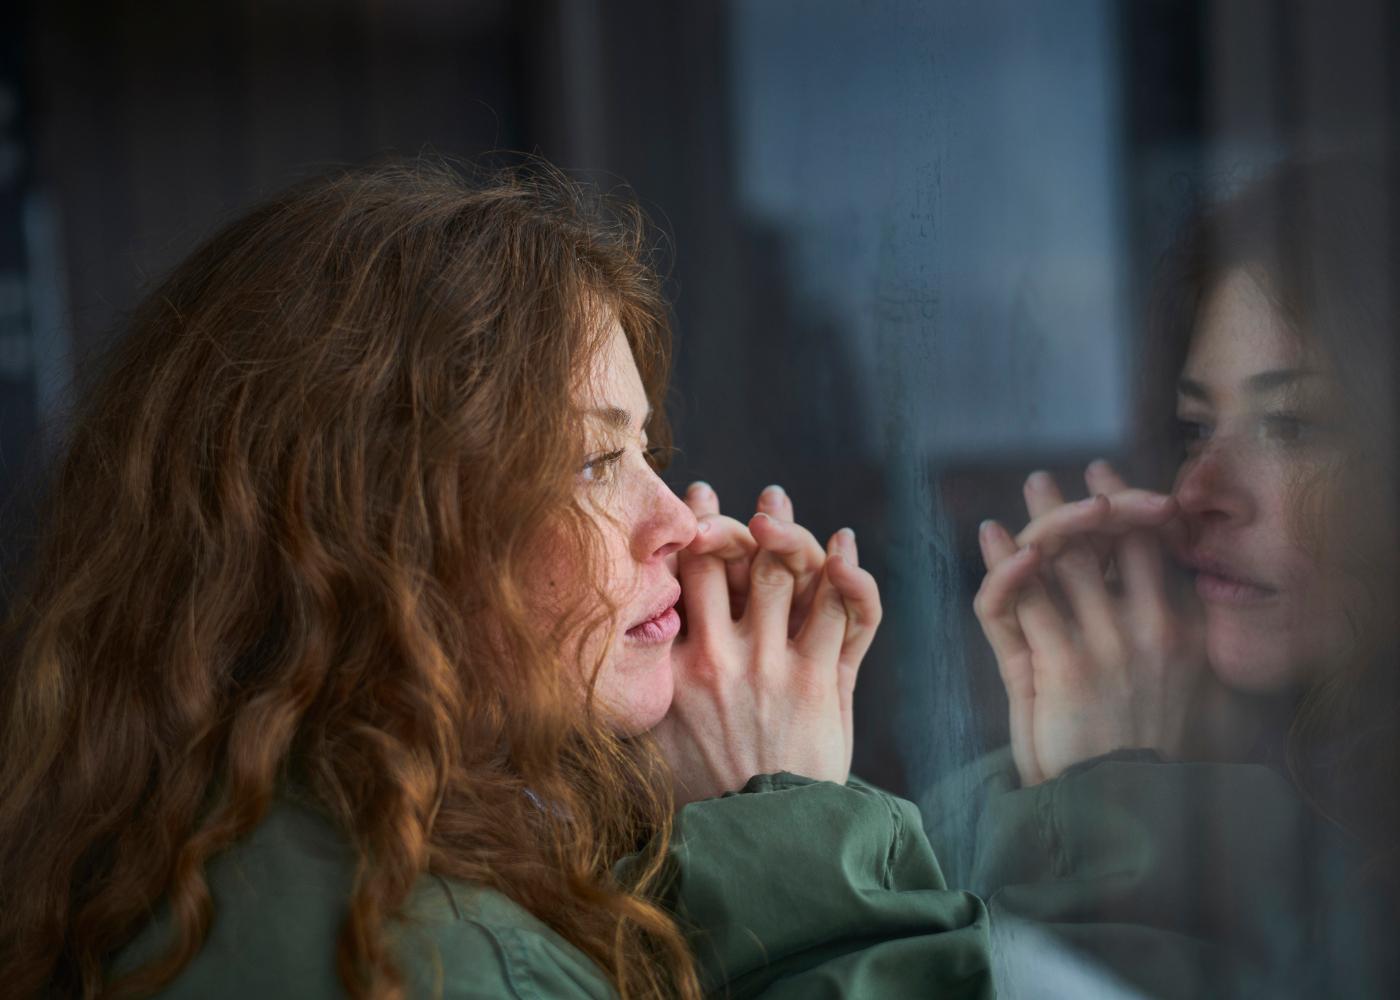 mulher a olhar pela janela a pensar